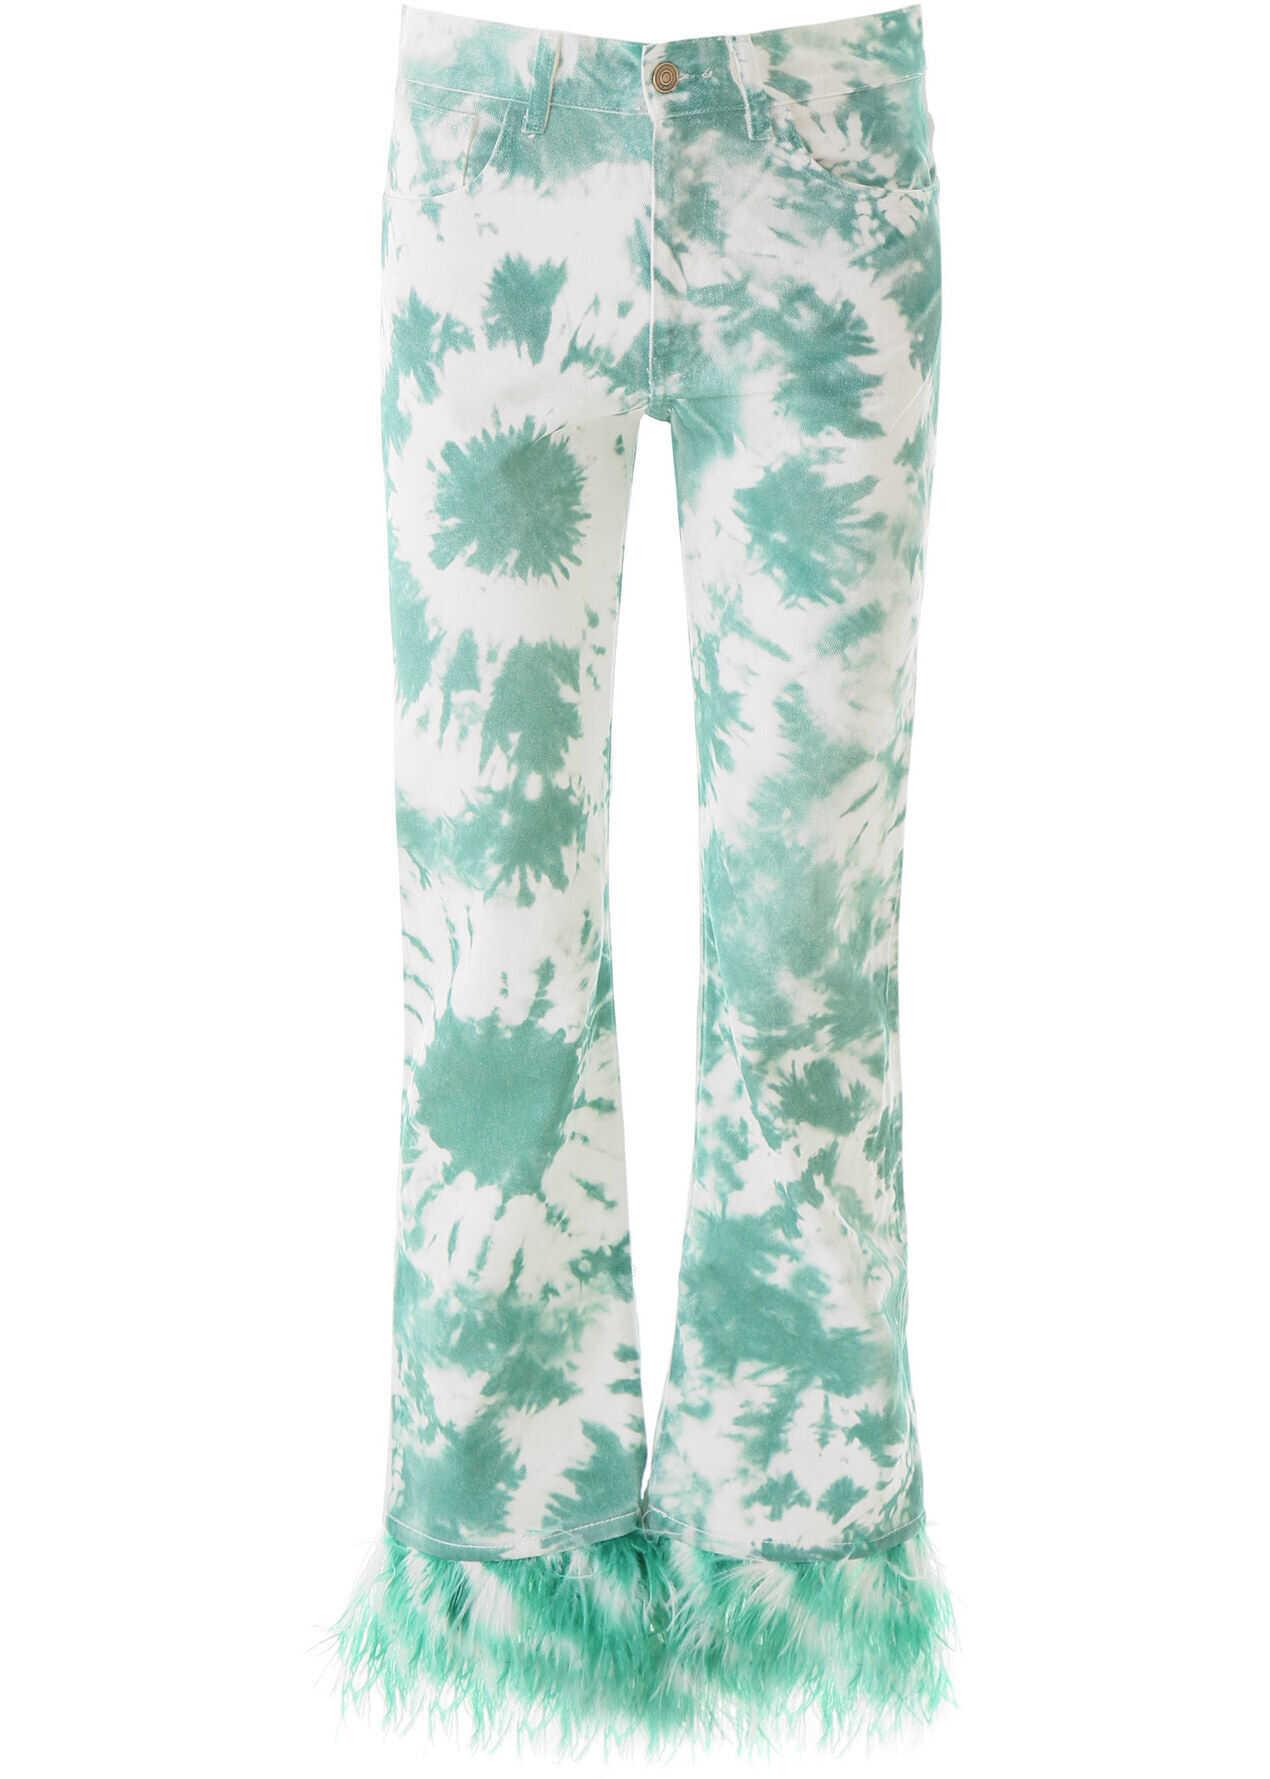 ALANUI Tie-Die Jeans With Feathers SMERALDO